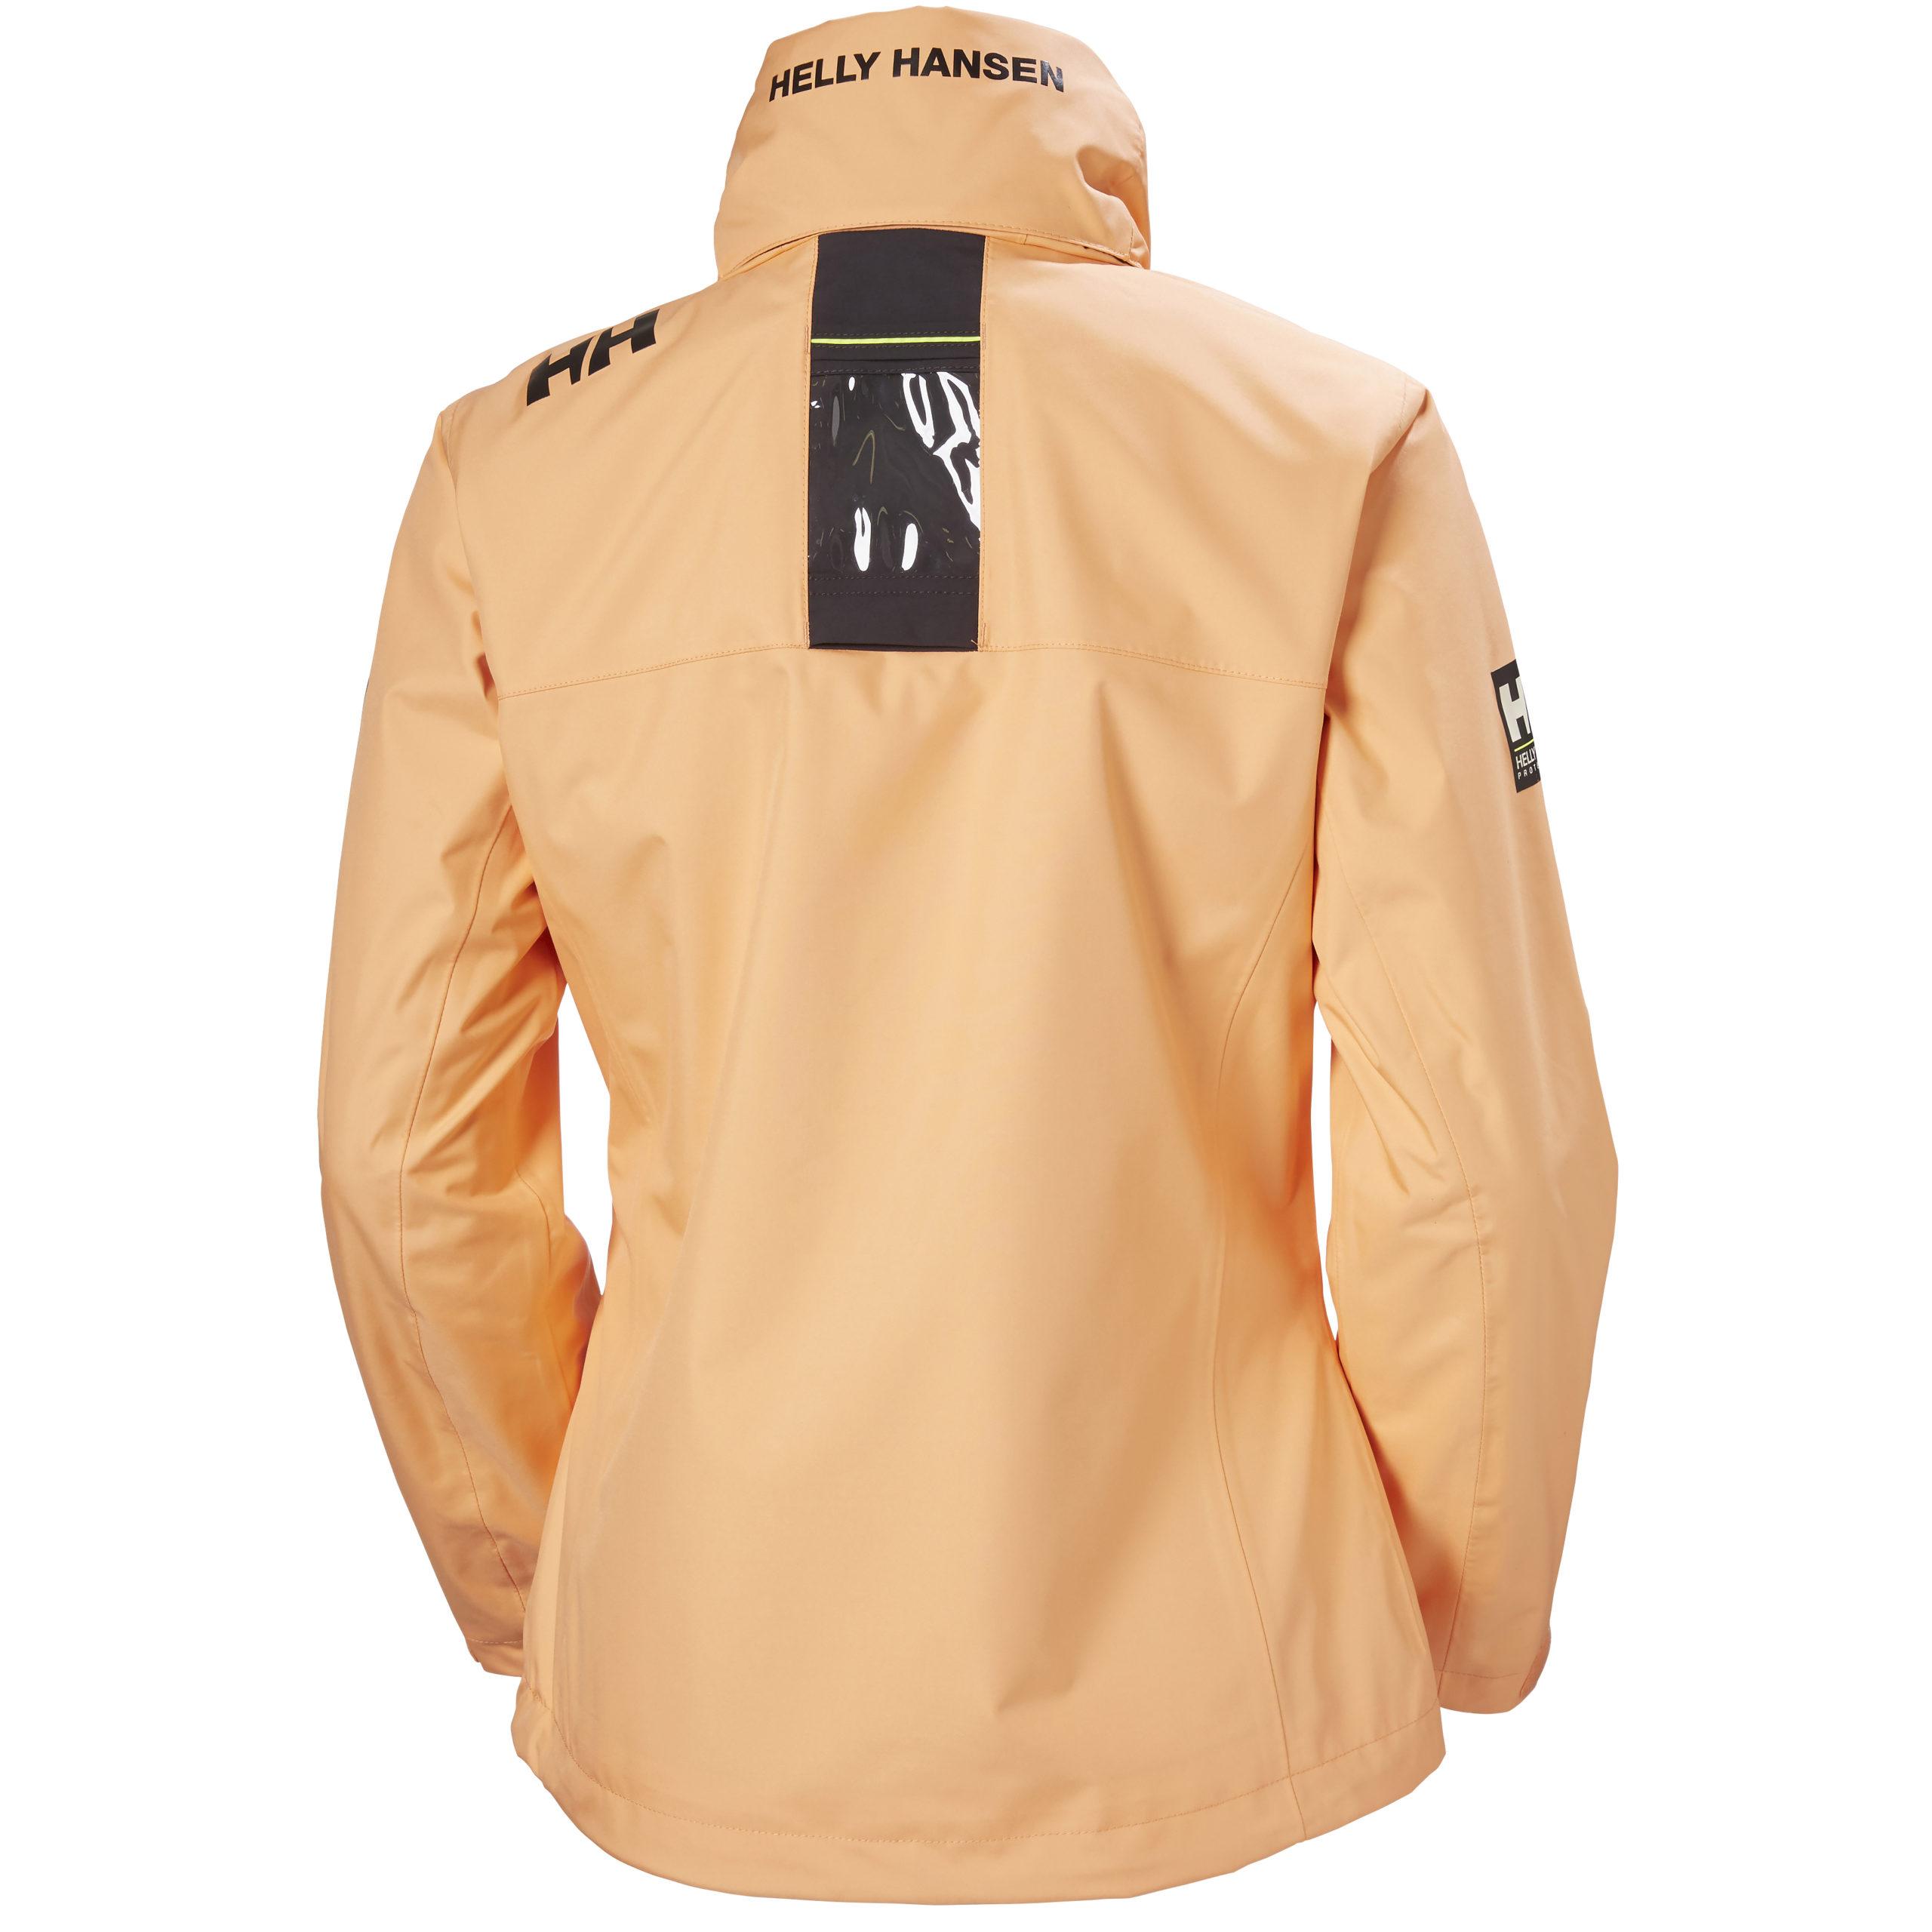 Helly Hansen W Crew Hooded Midlayer Jacket Blouson De Sport Femme